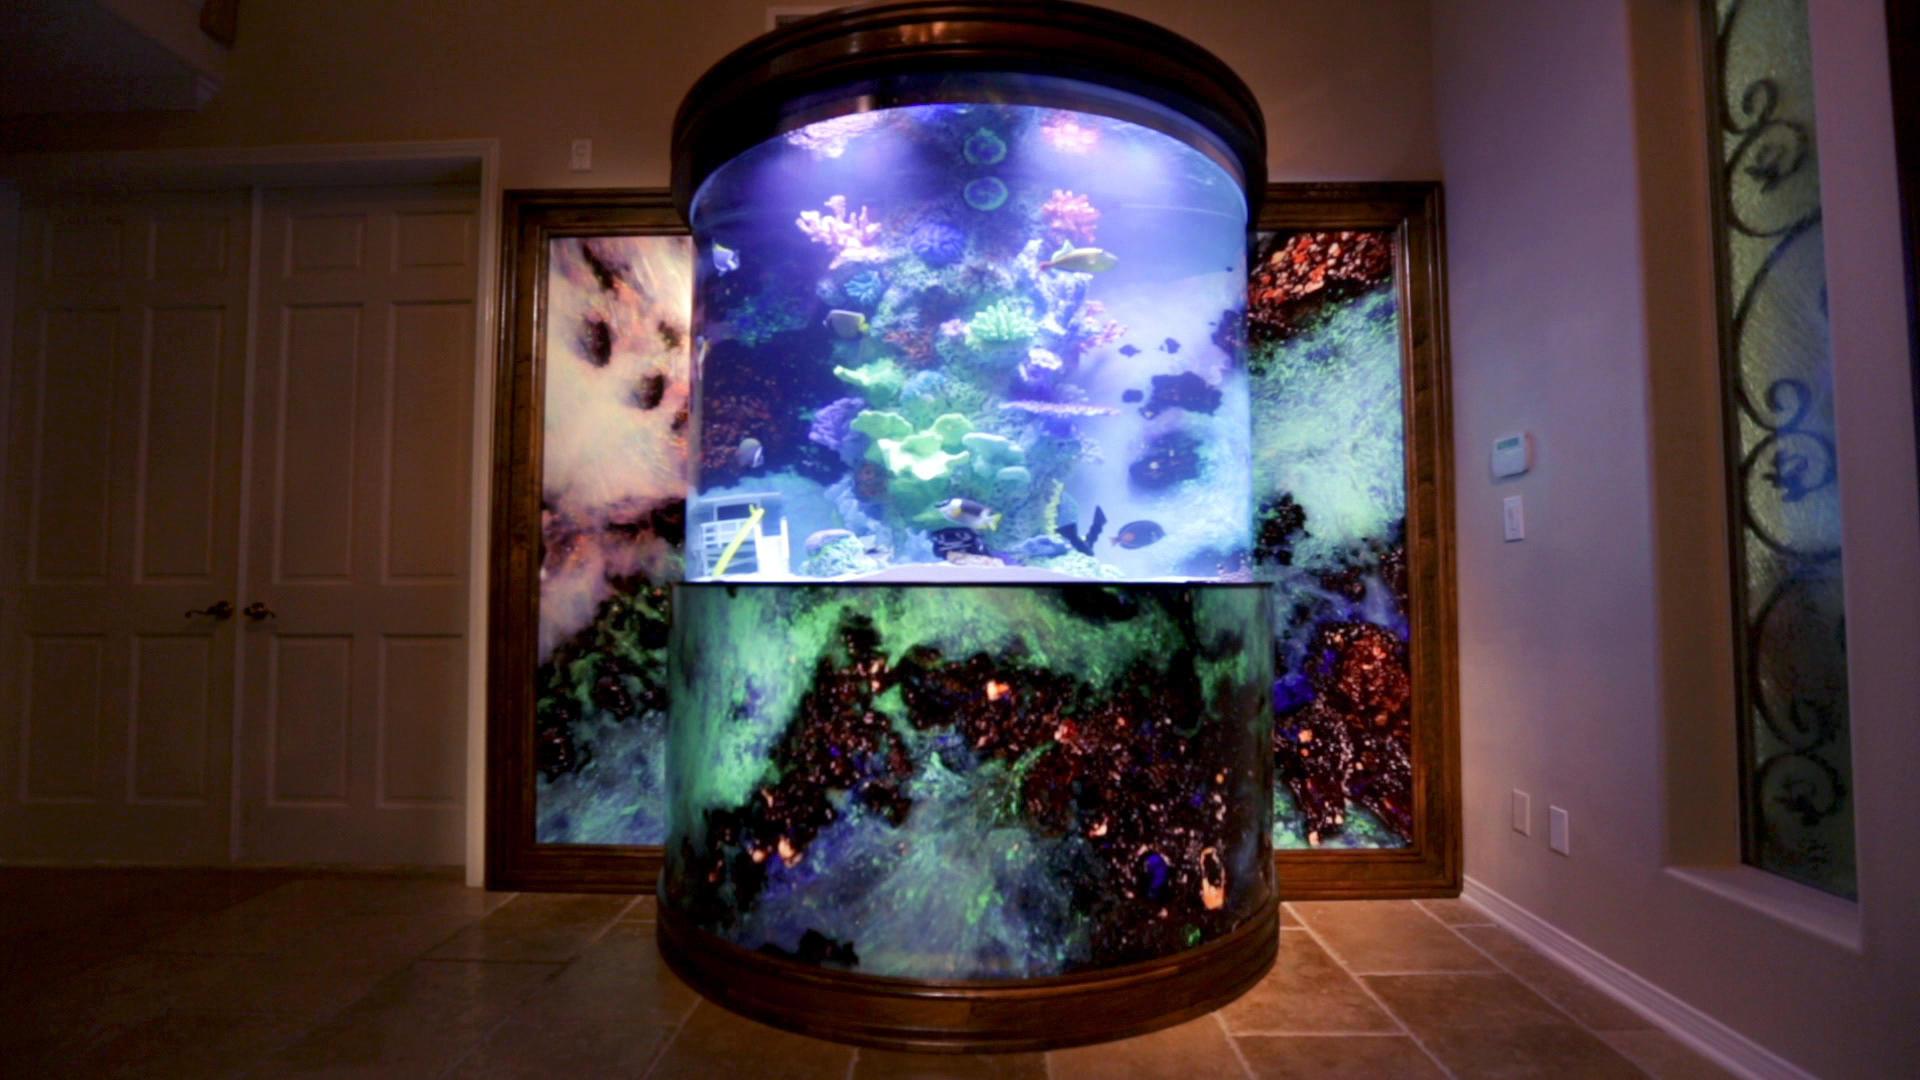 david hasslehoff's custom fish tank